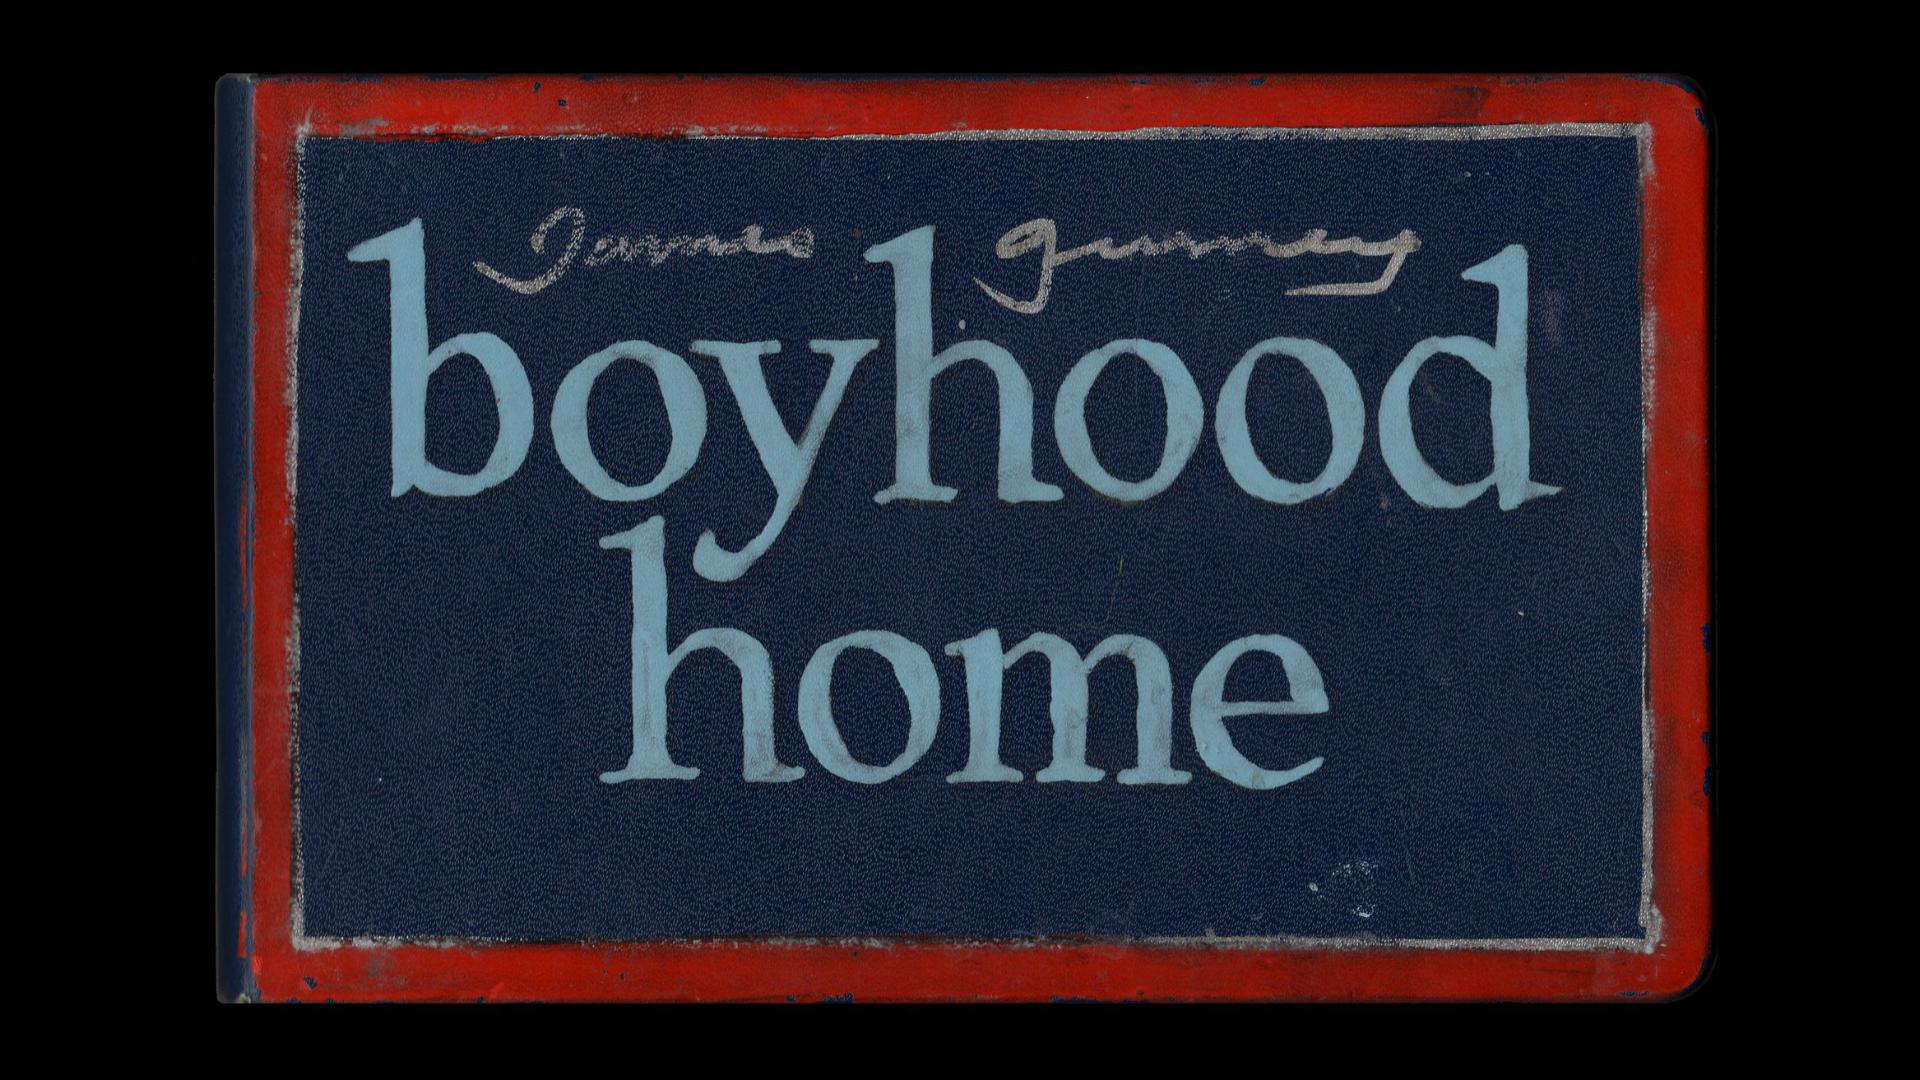 His latest app, Vol 1 Boyhood Home.